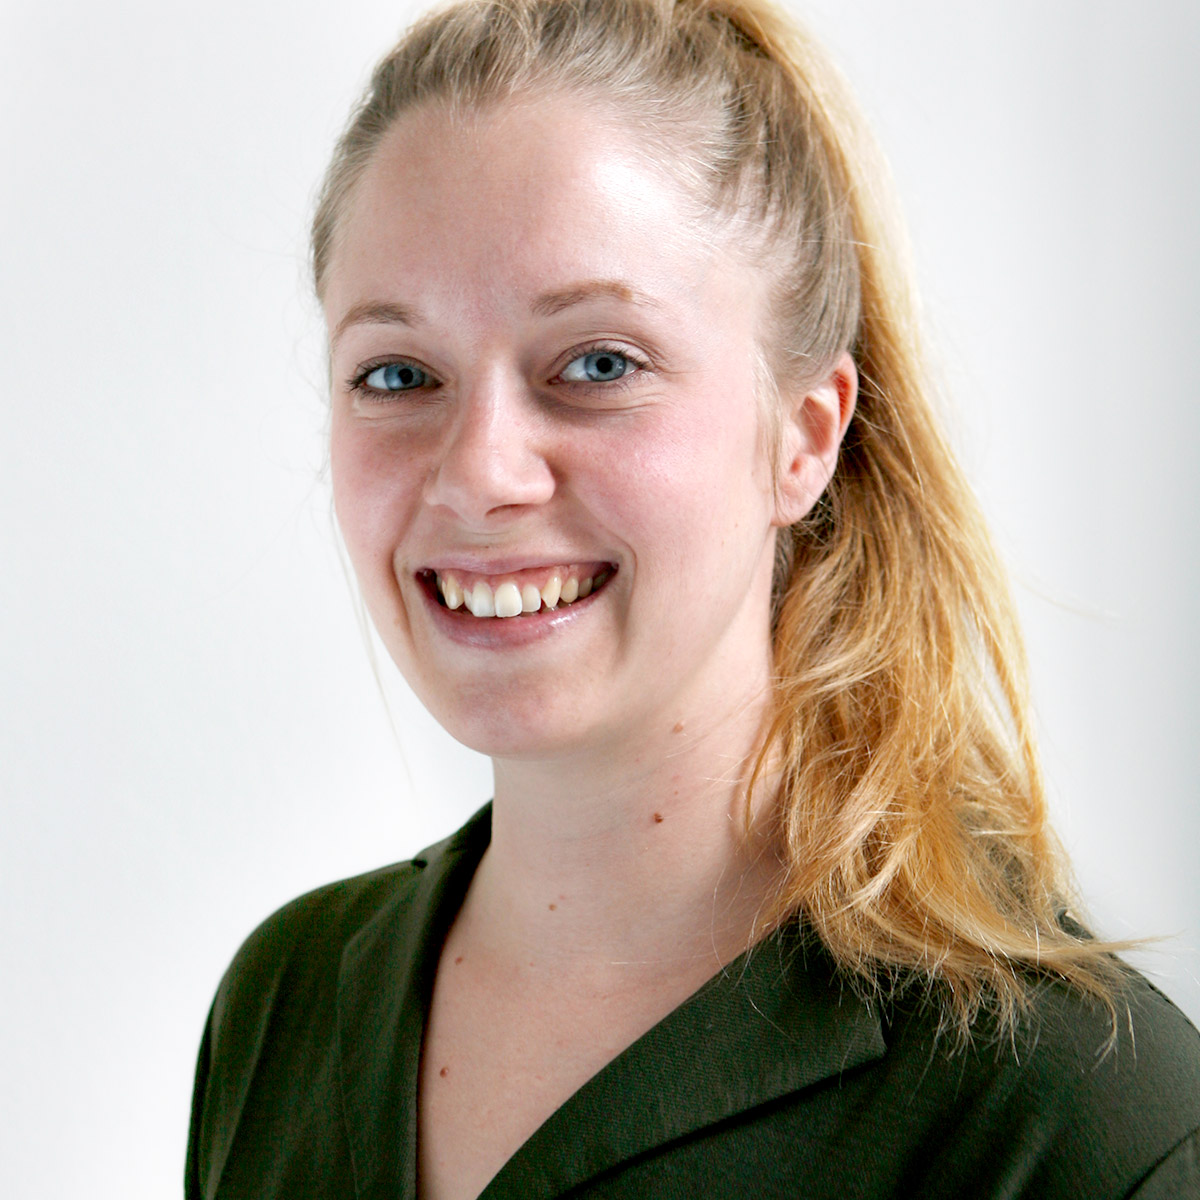 Ansprechpartnerin Jessica Bratka